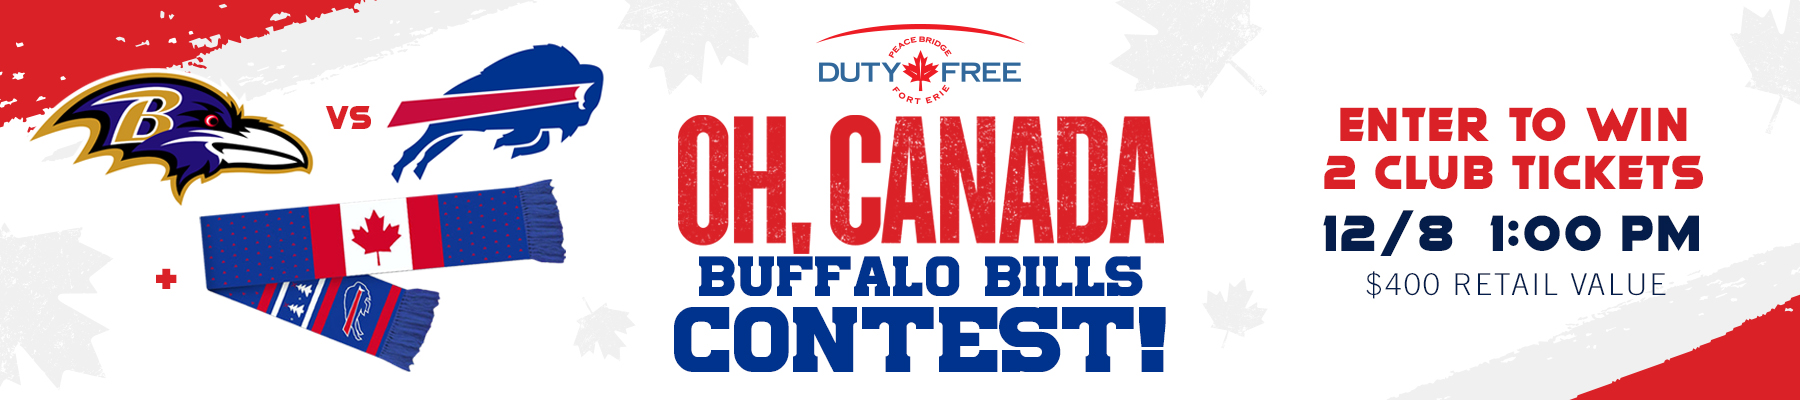 Oh, Canada Buffalo Bill Contest